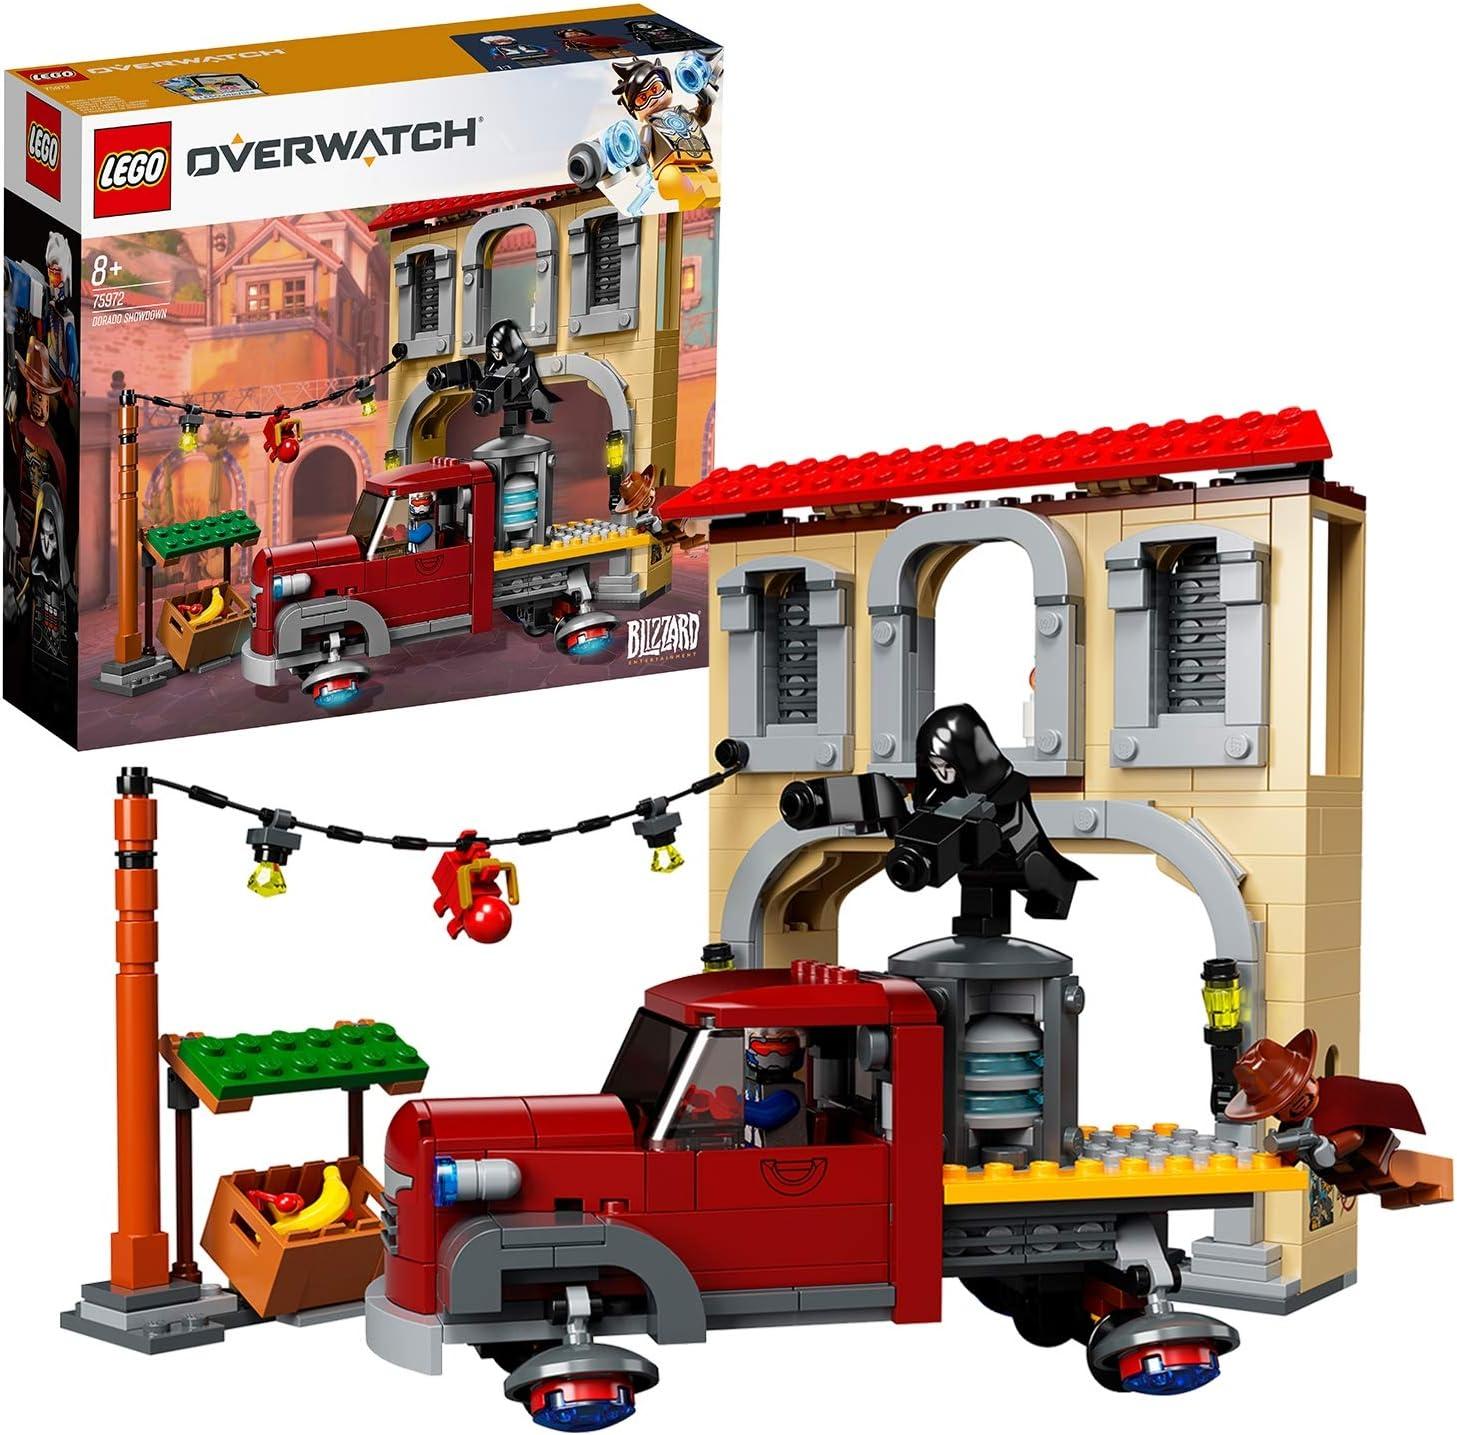 LEGO 75972 Overwatch Dorado Showdown Building Kit, Multicolour